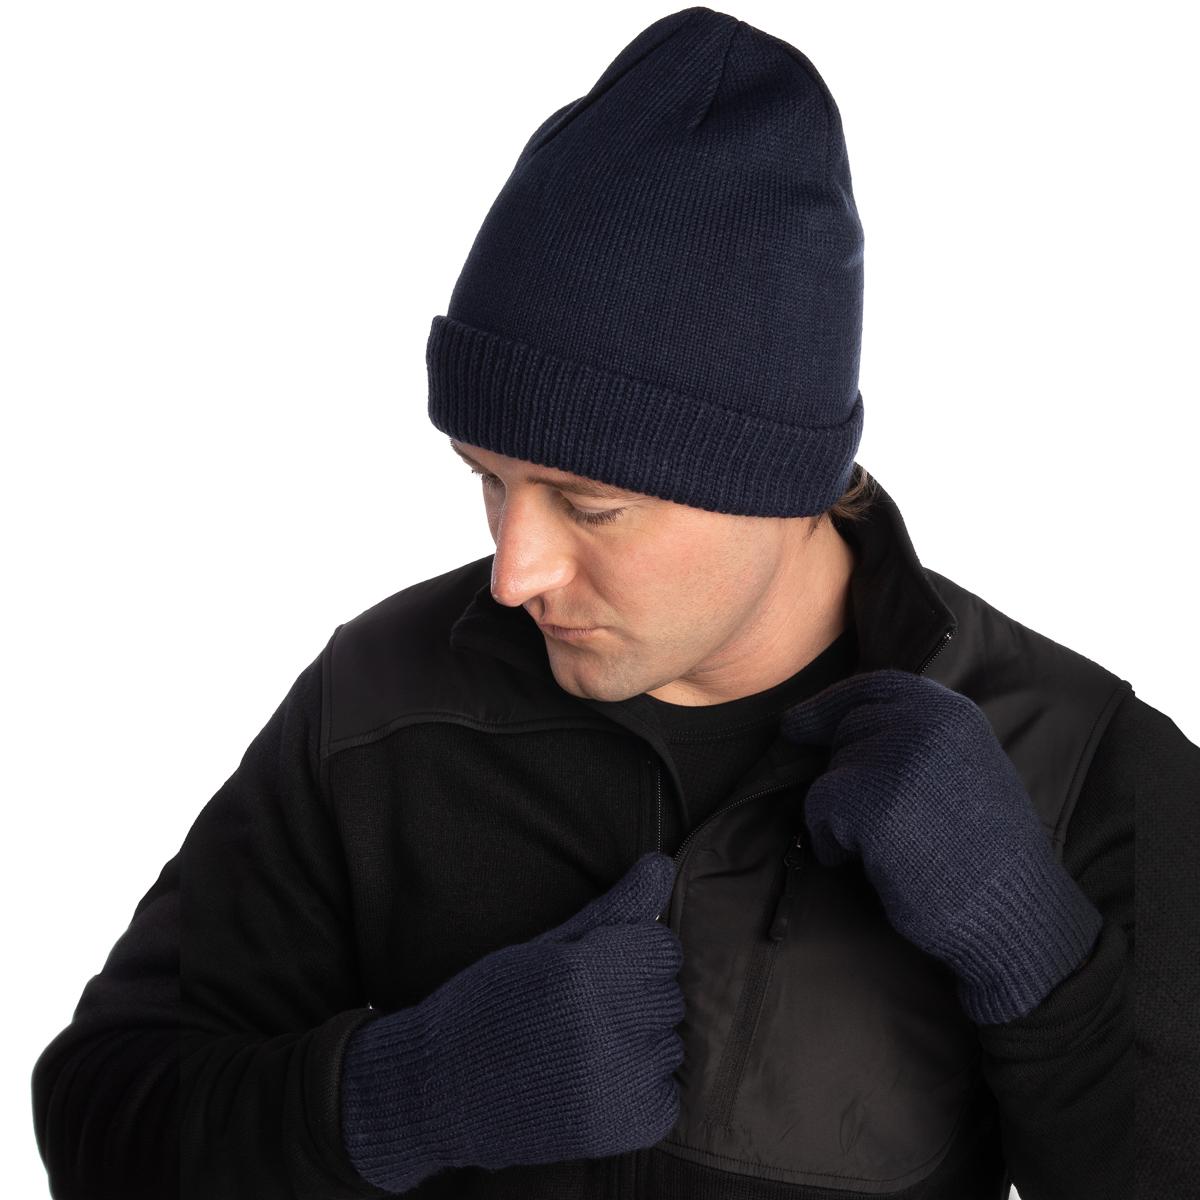 Mens Winter Hat and Gloves Set Warm Fleece Beanie Knit Hat with Winter Gloves